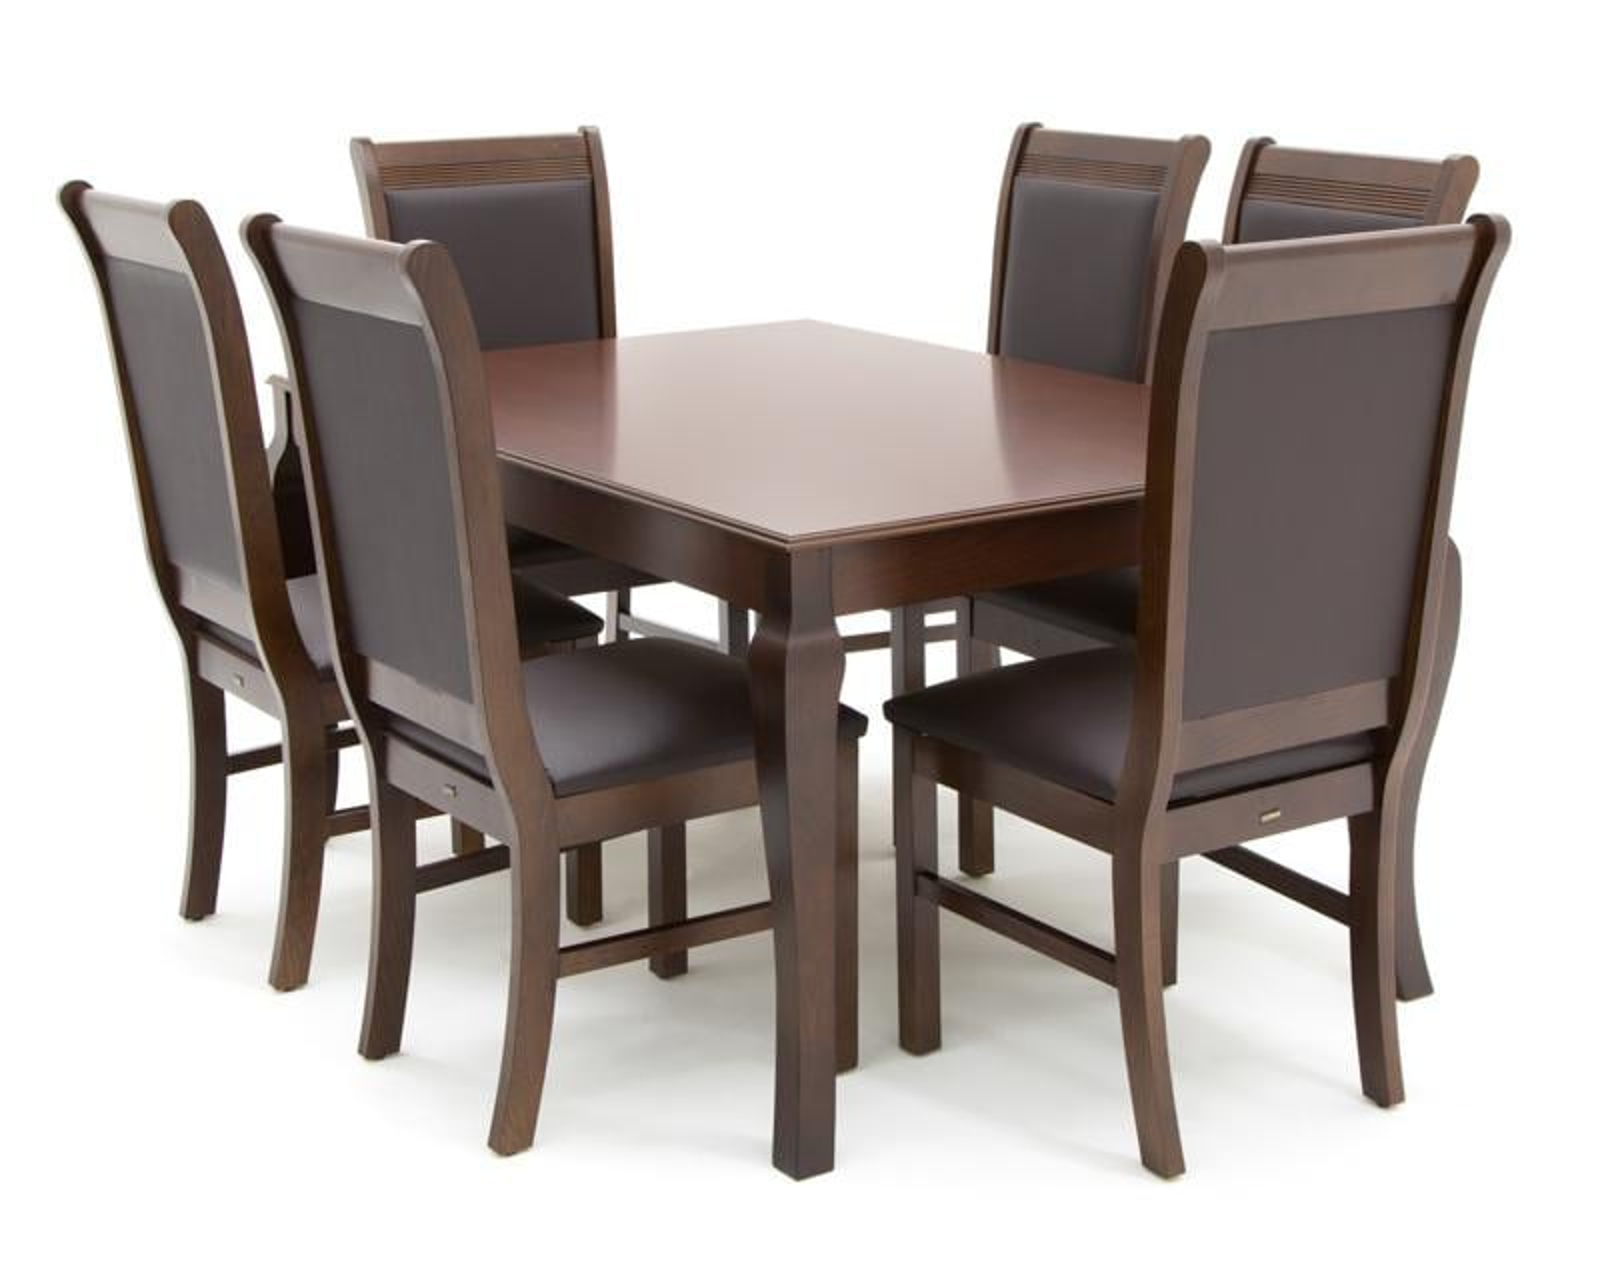 Comedor sevilla de 6 sillas 3455713 coppel for Silla comedor para ninos